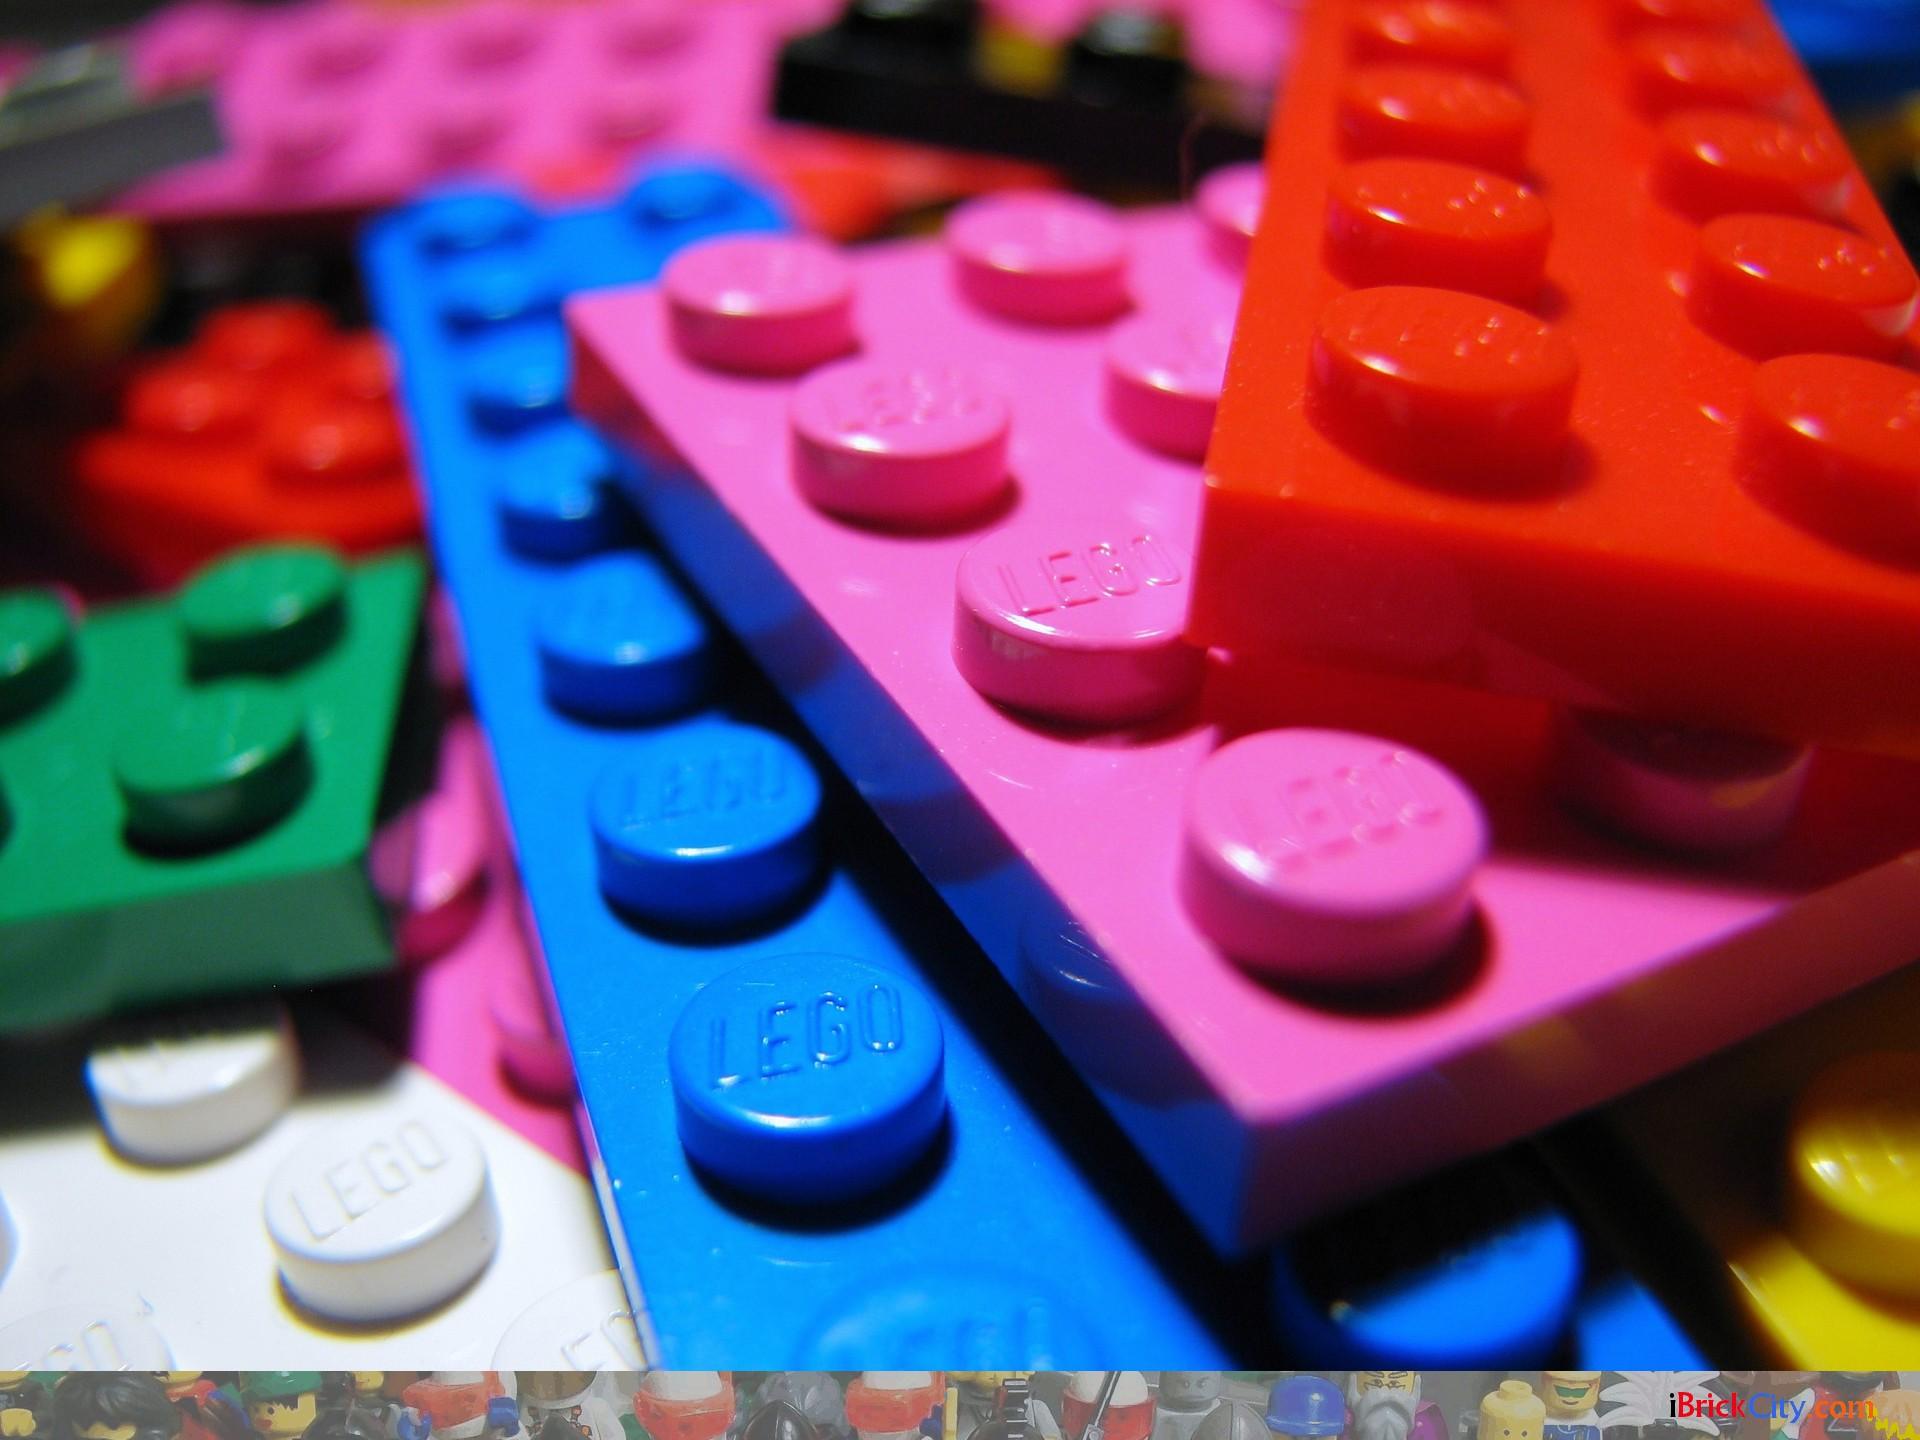 pics photos thumbs lego wallpaper pack 1 ibrickcity 18